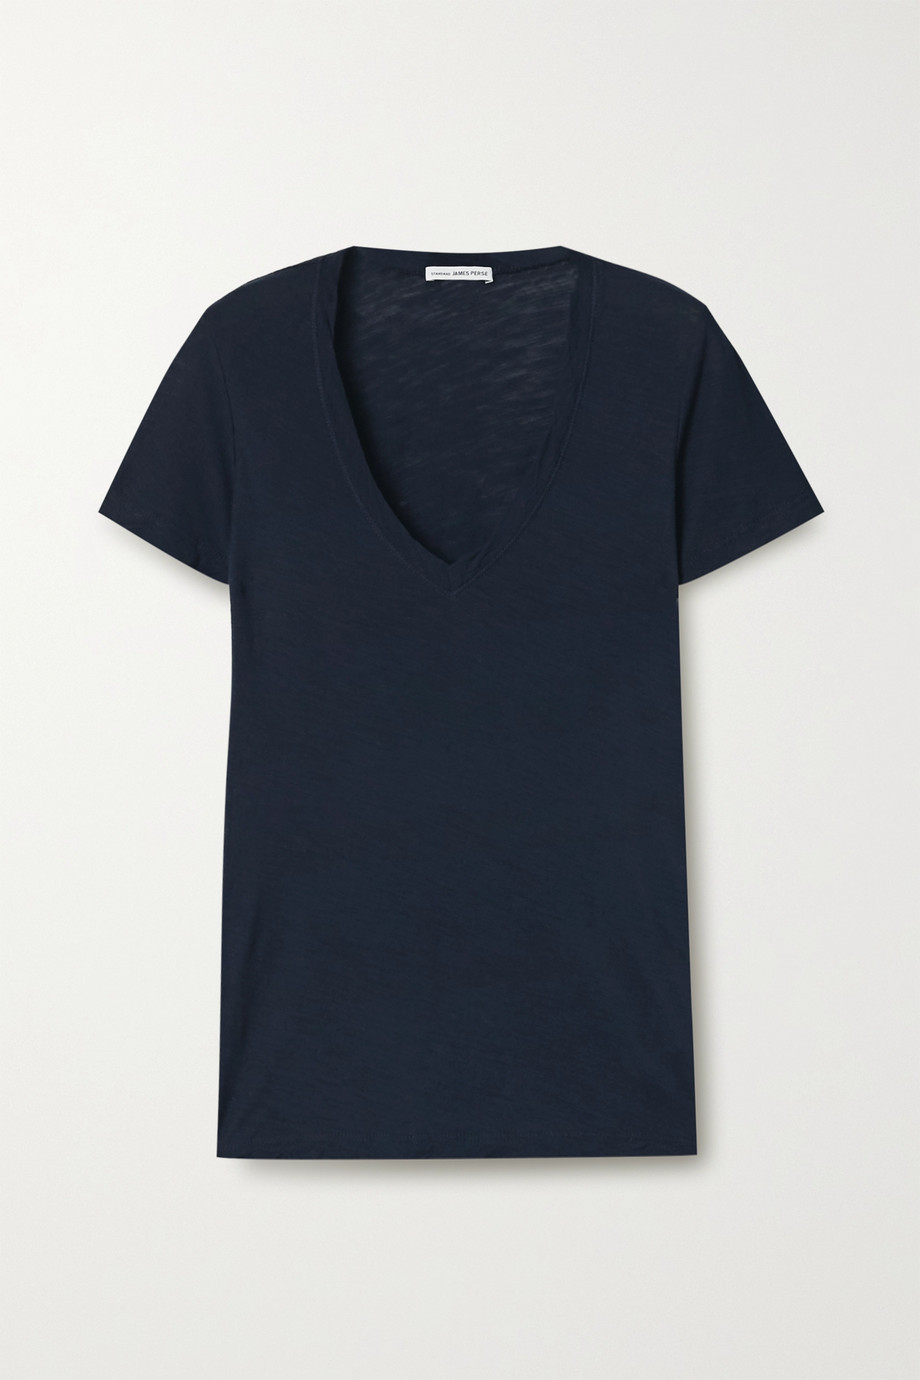 James Perse Slub Supima cotton-jersey T-shirt